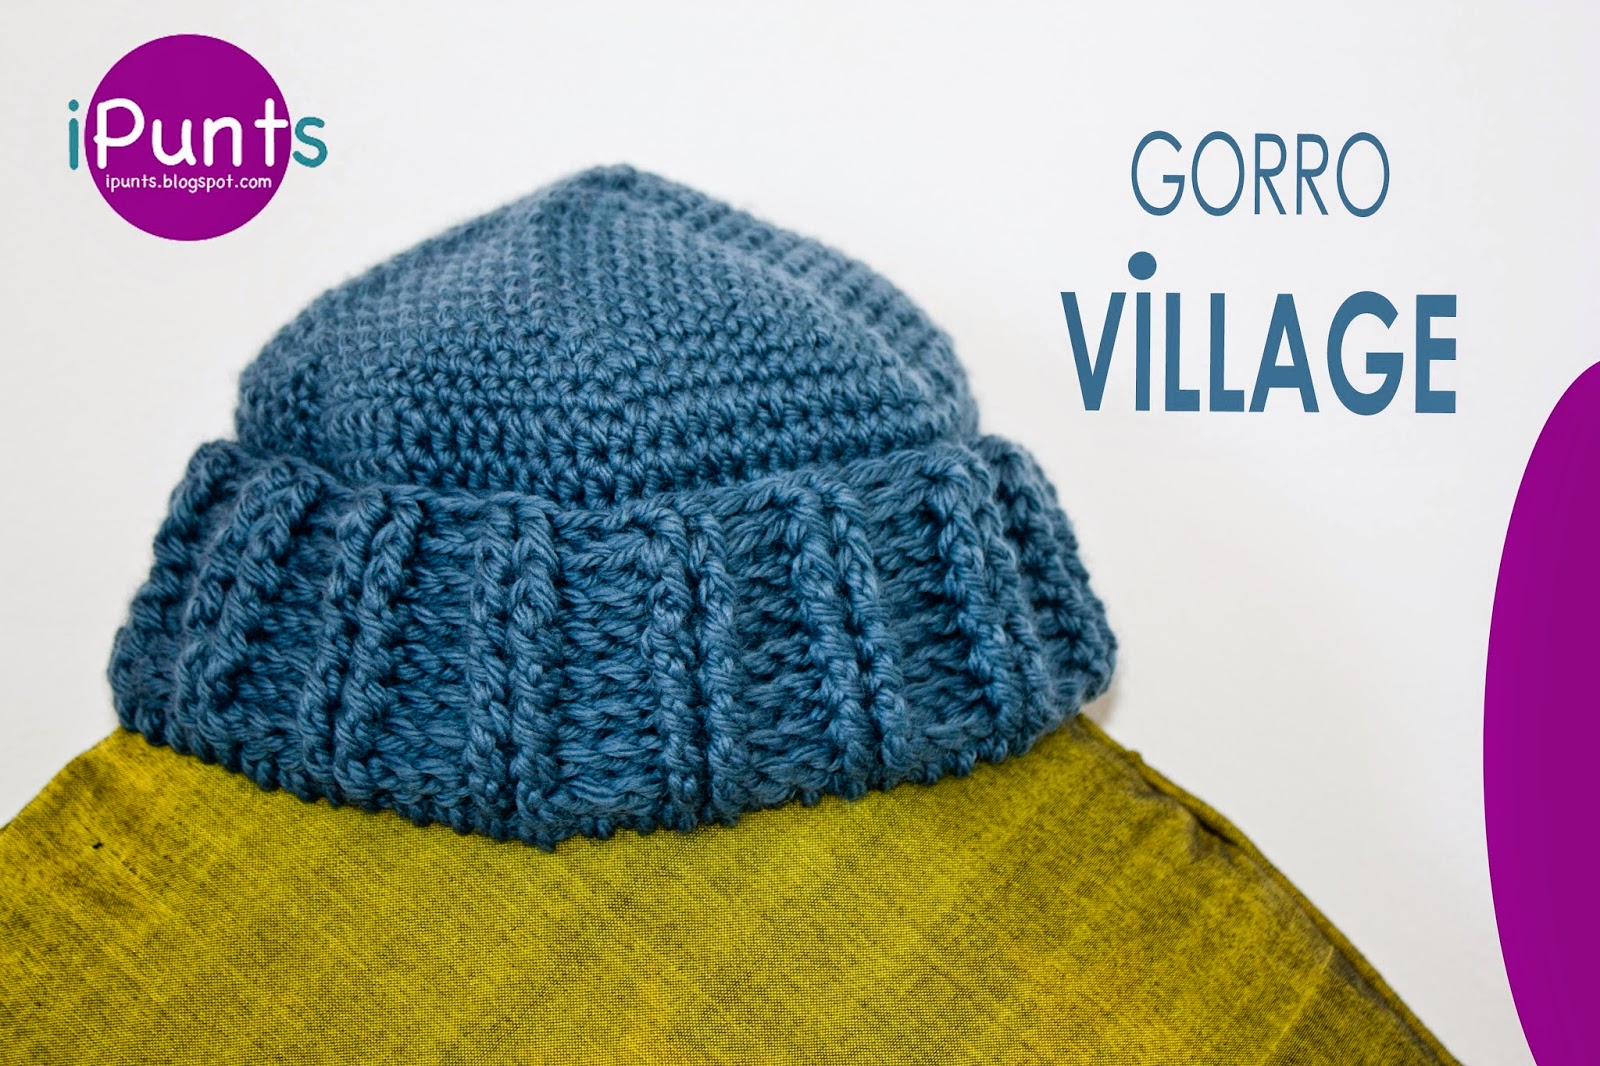 iPunts: Gorro Village a ganchillo (Crochet)